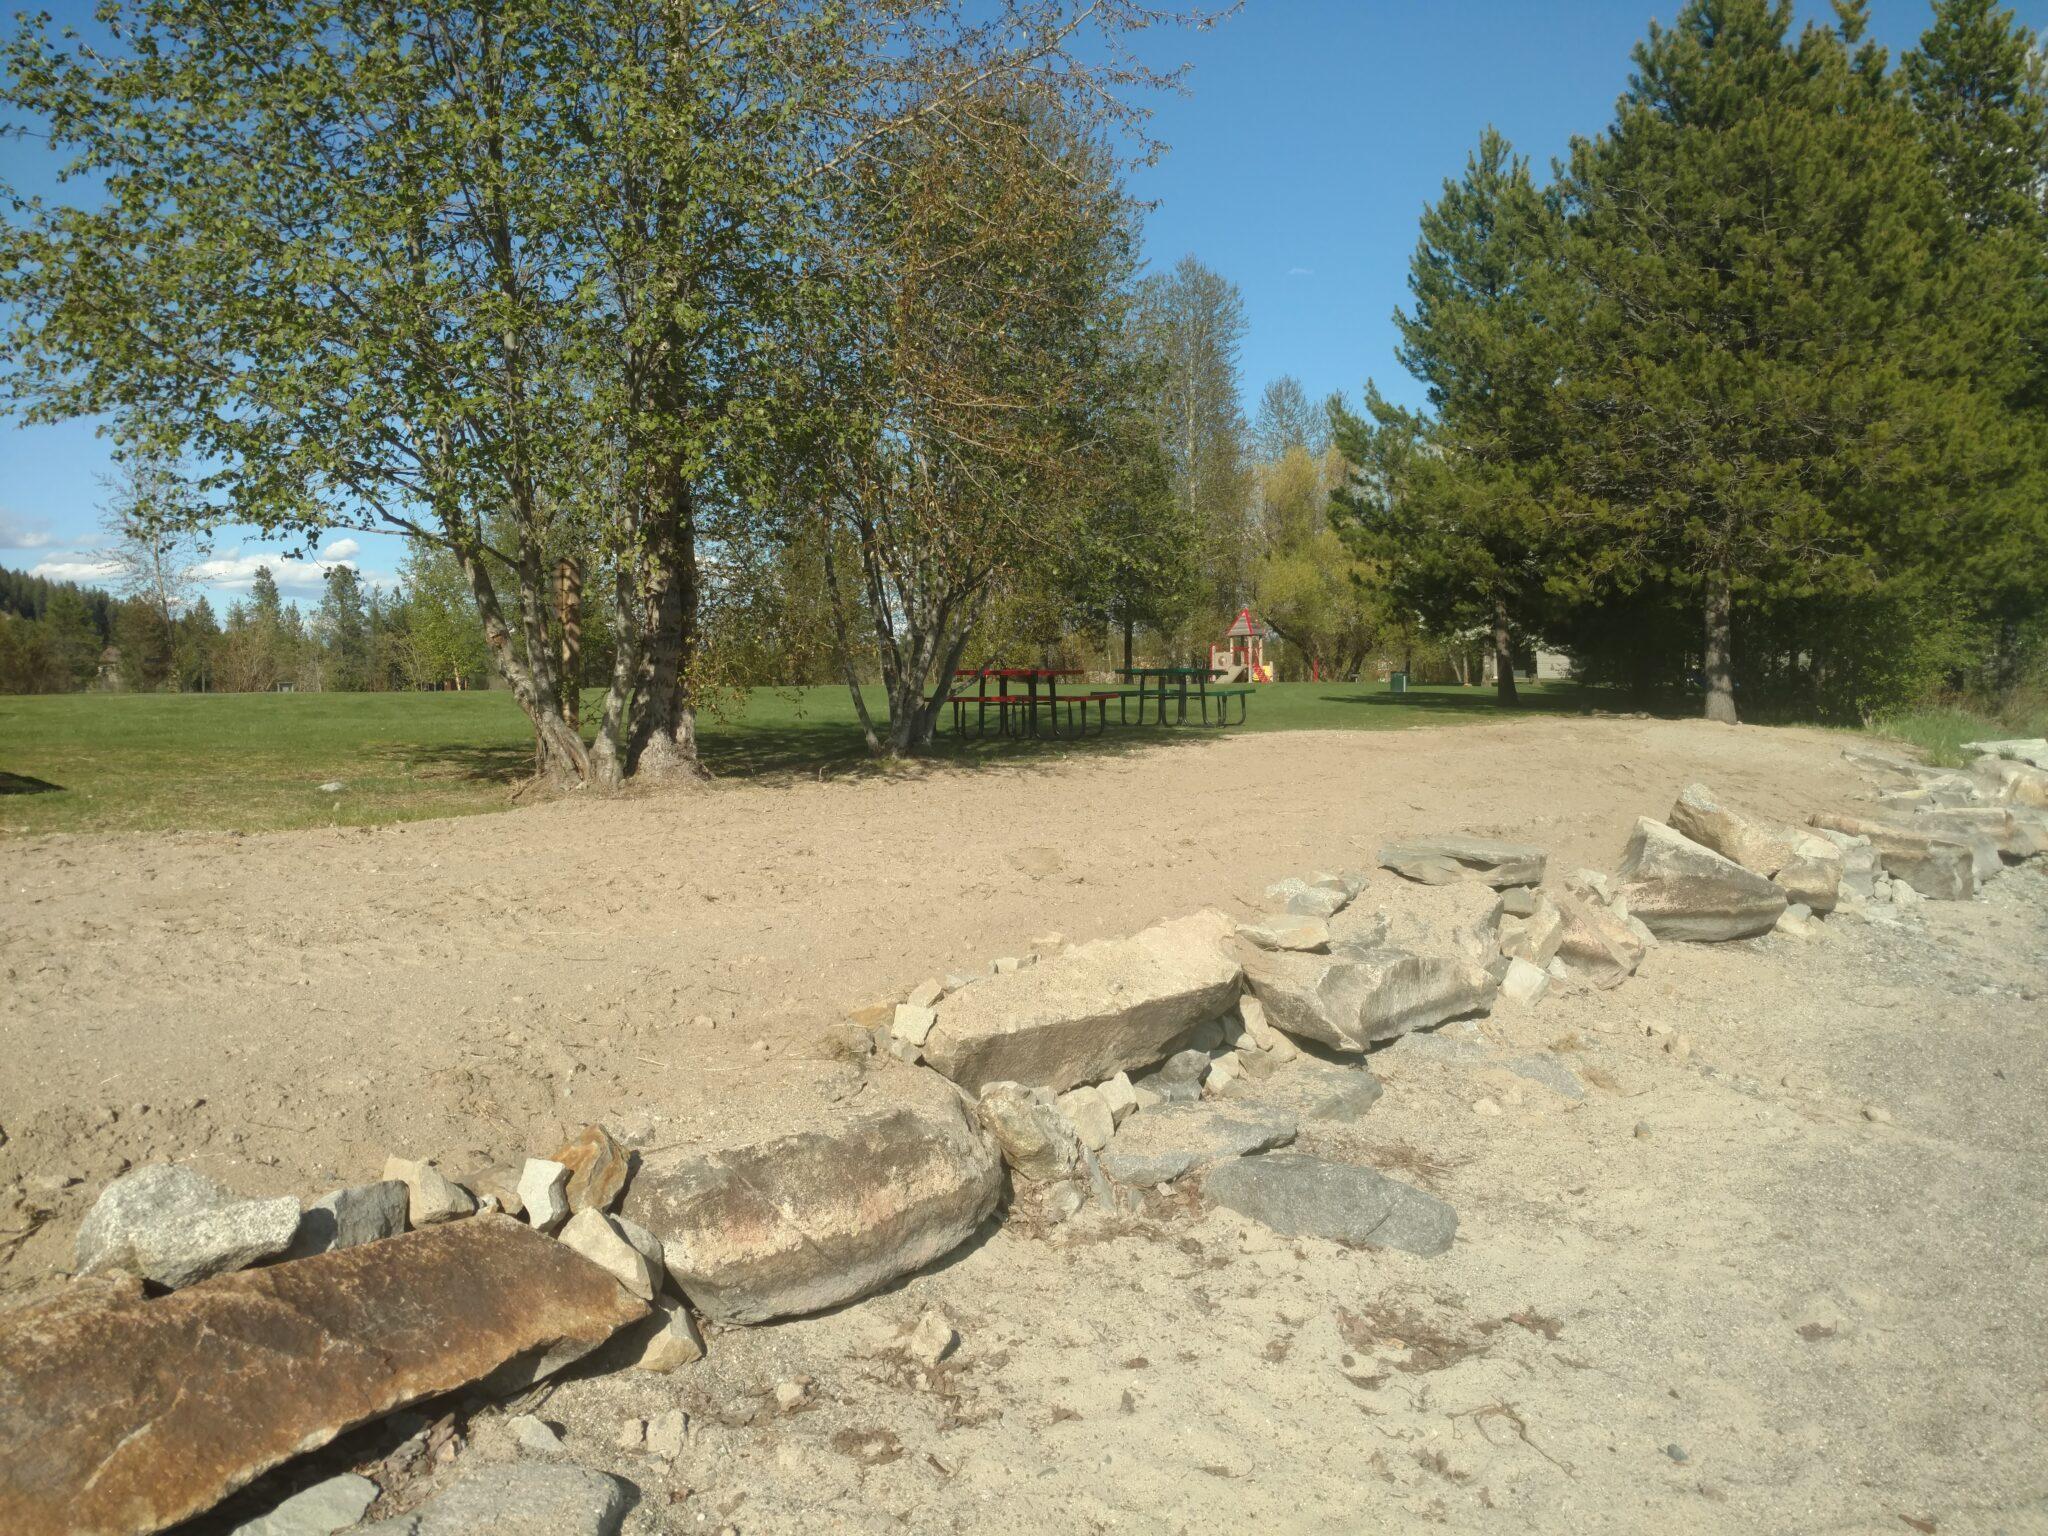 New Sand At City Beach!